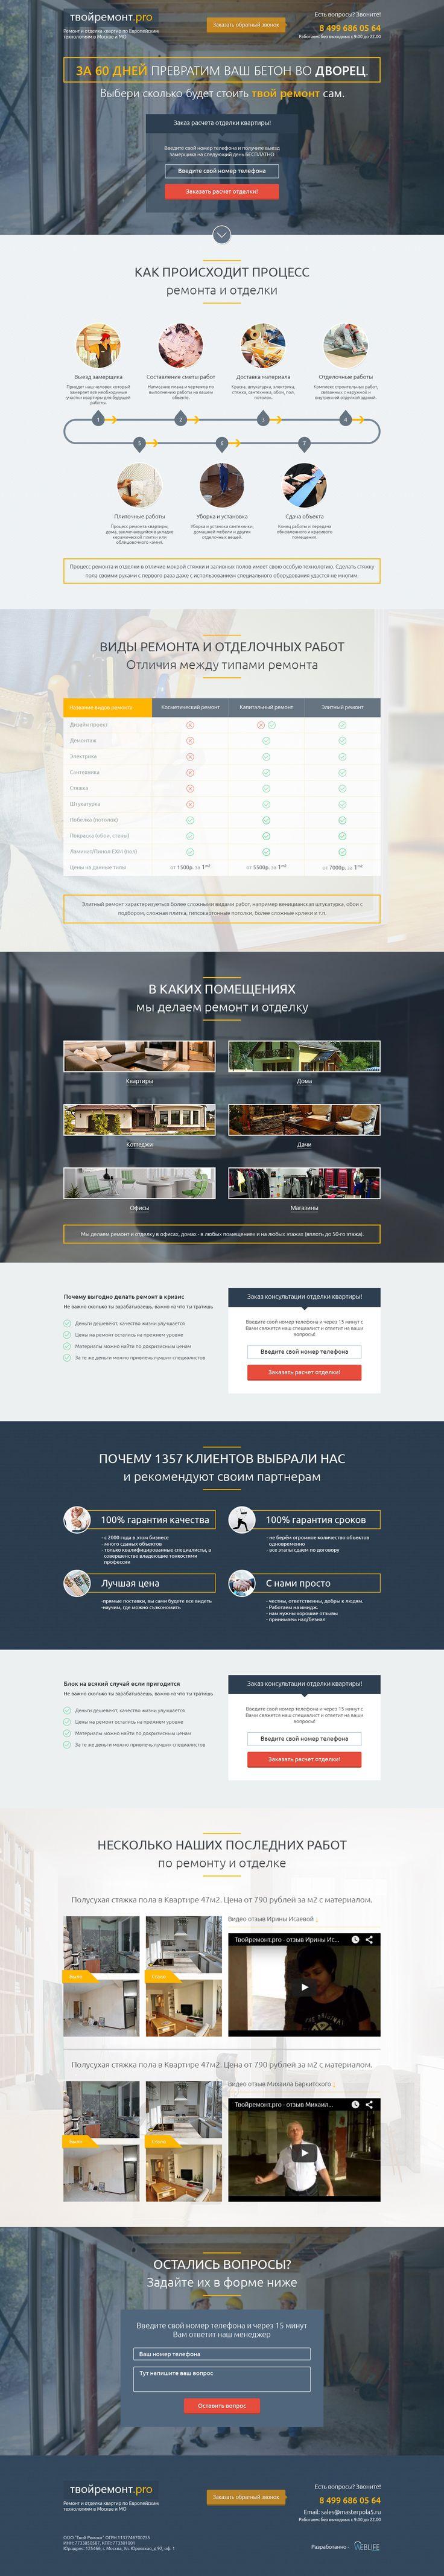 web-design for build remont company. #webdesign #landingpage #weblife #building #remont #вебдизайн #одностраничник #ремонт